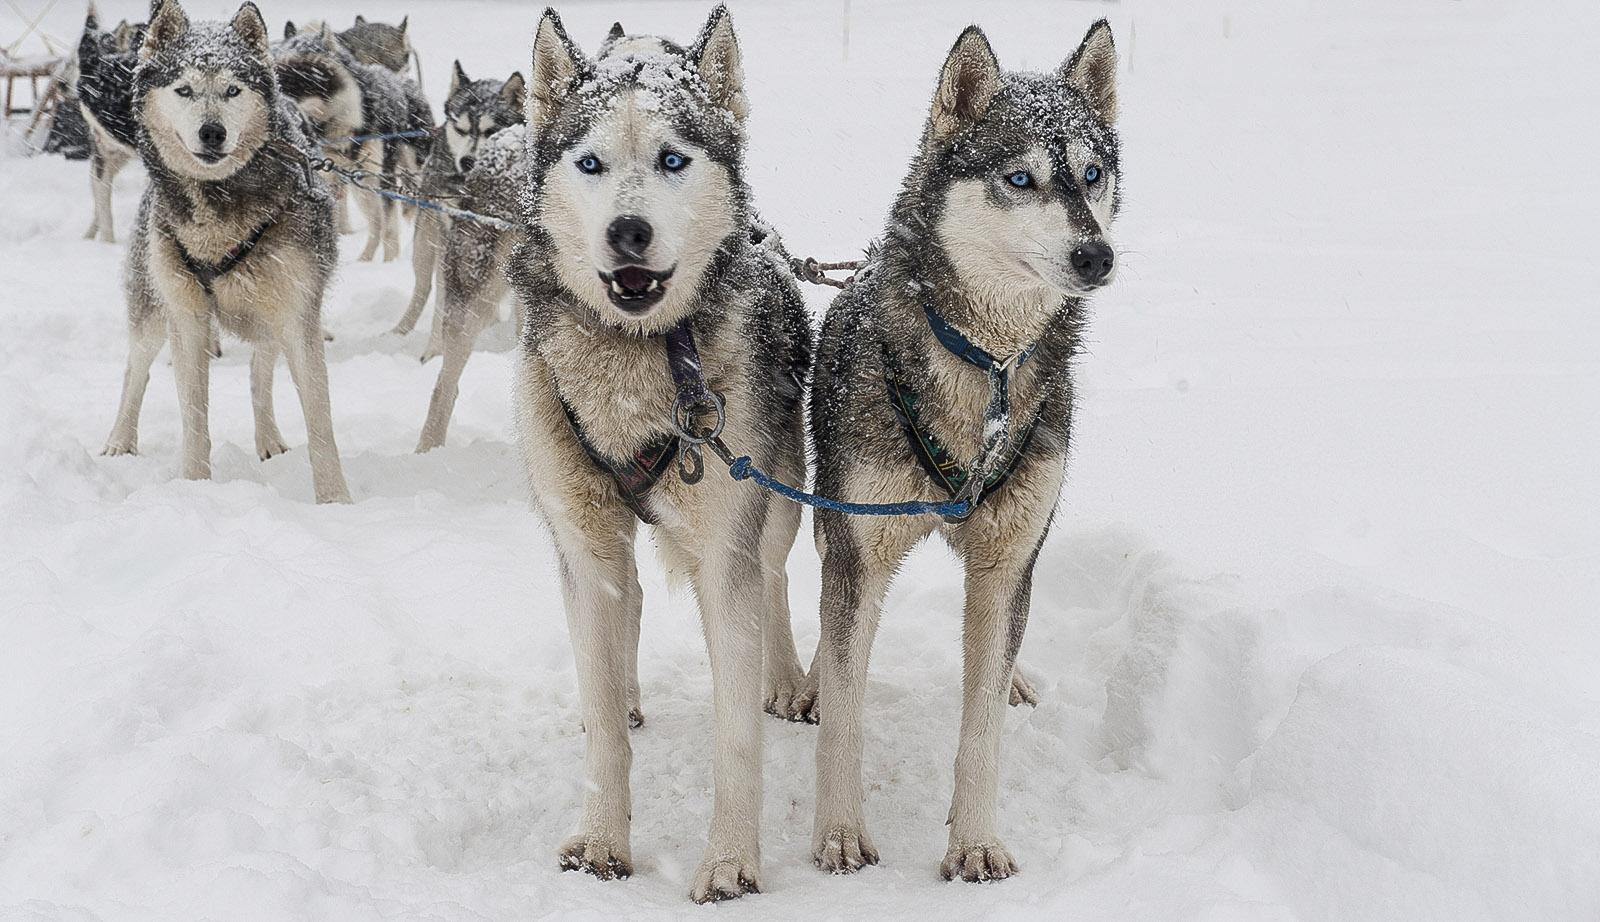 Barèges;: Huskies am Hundeschlittengespann. Foto: Hilke Maunder